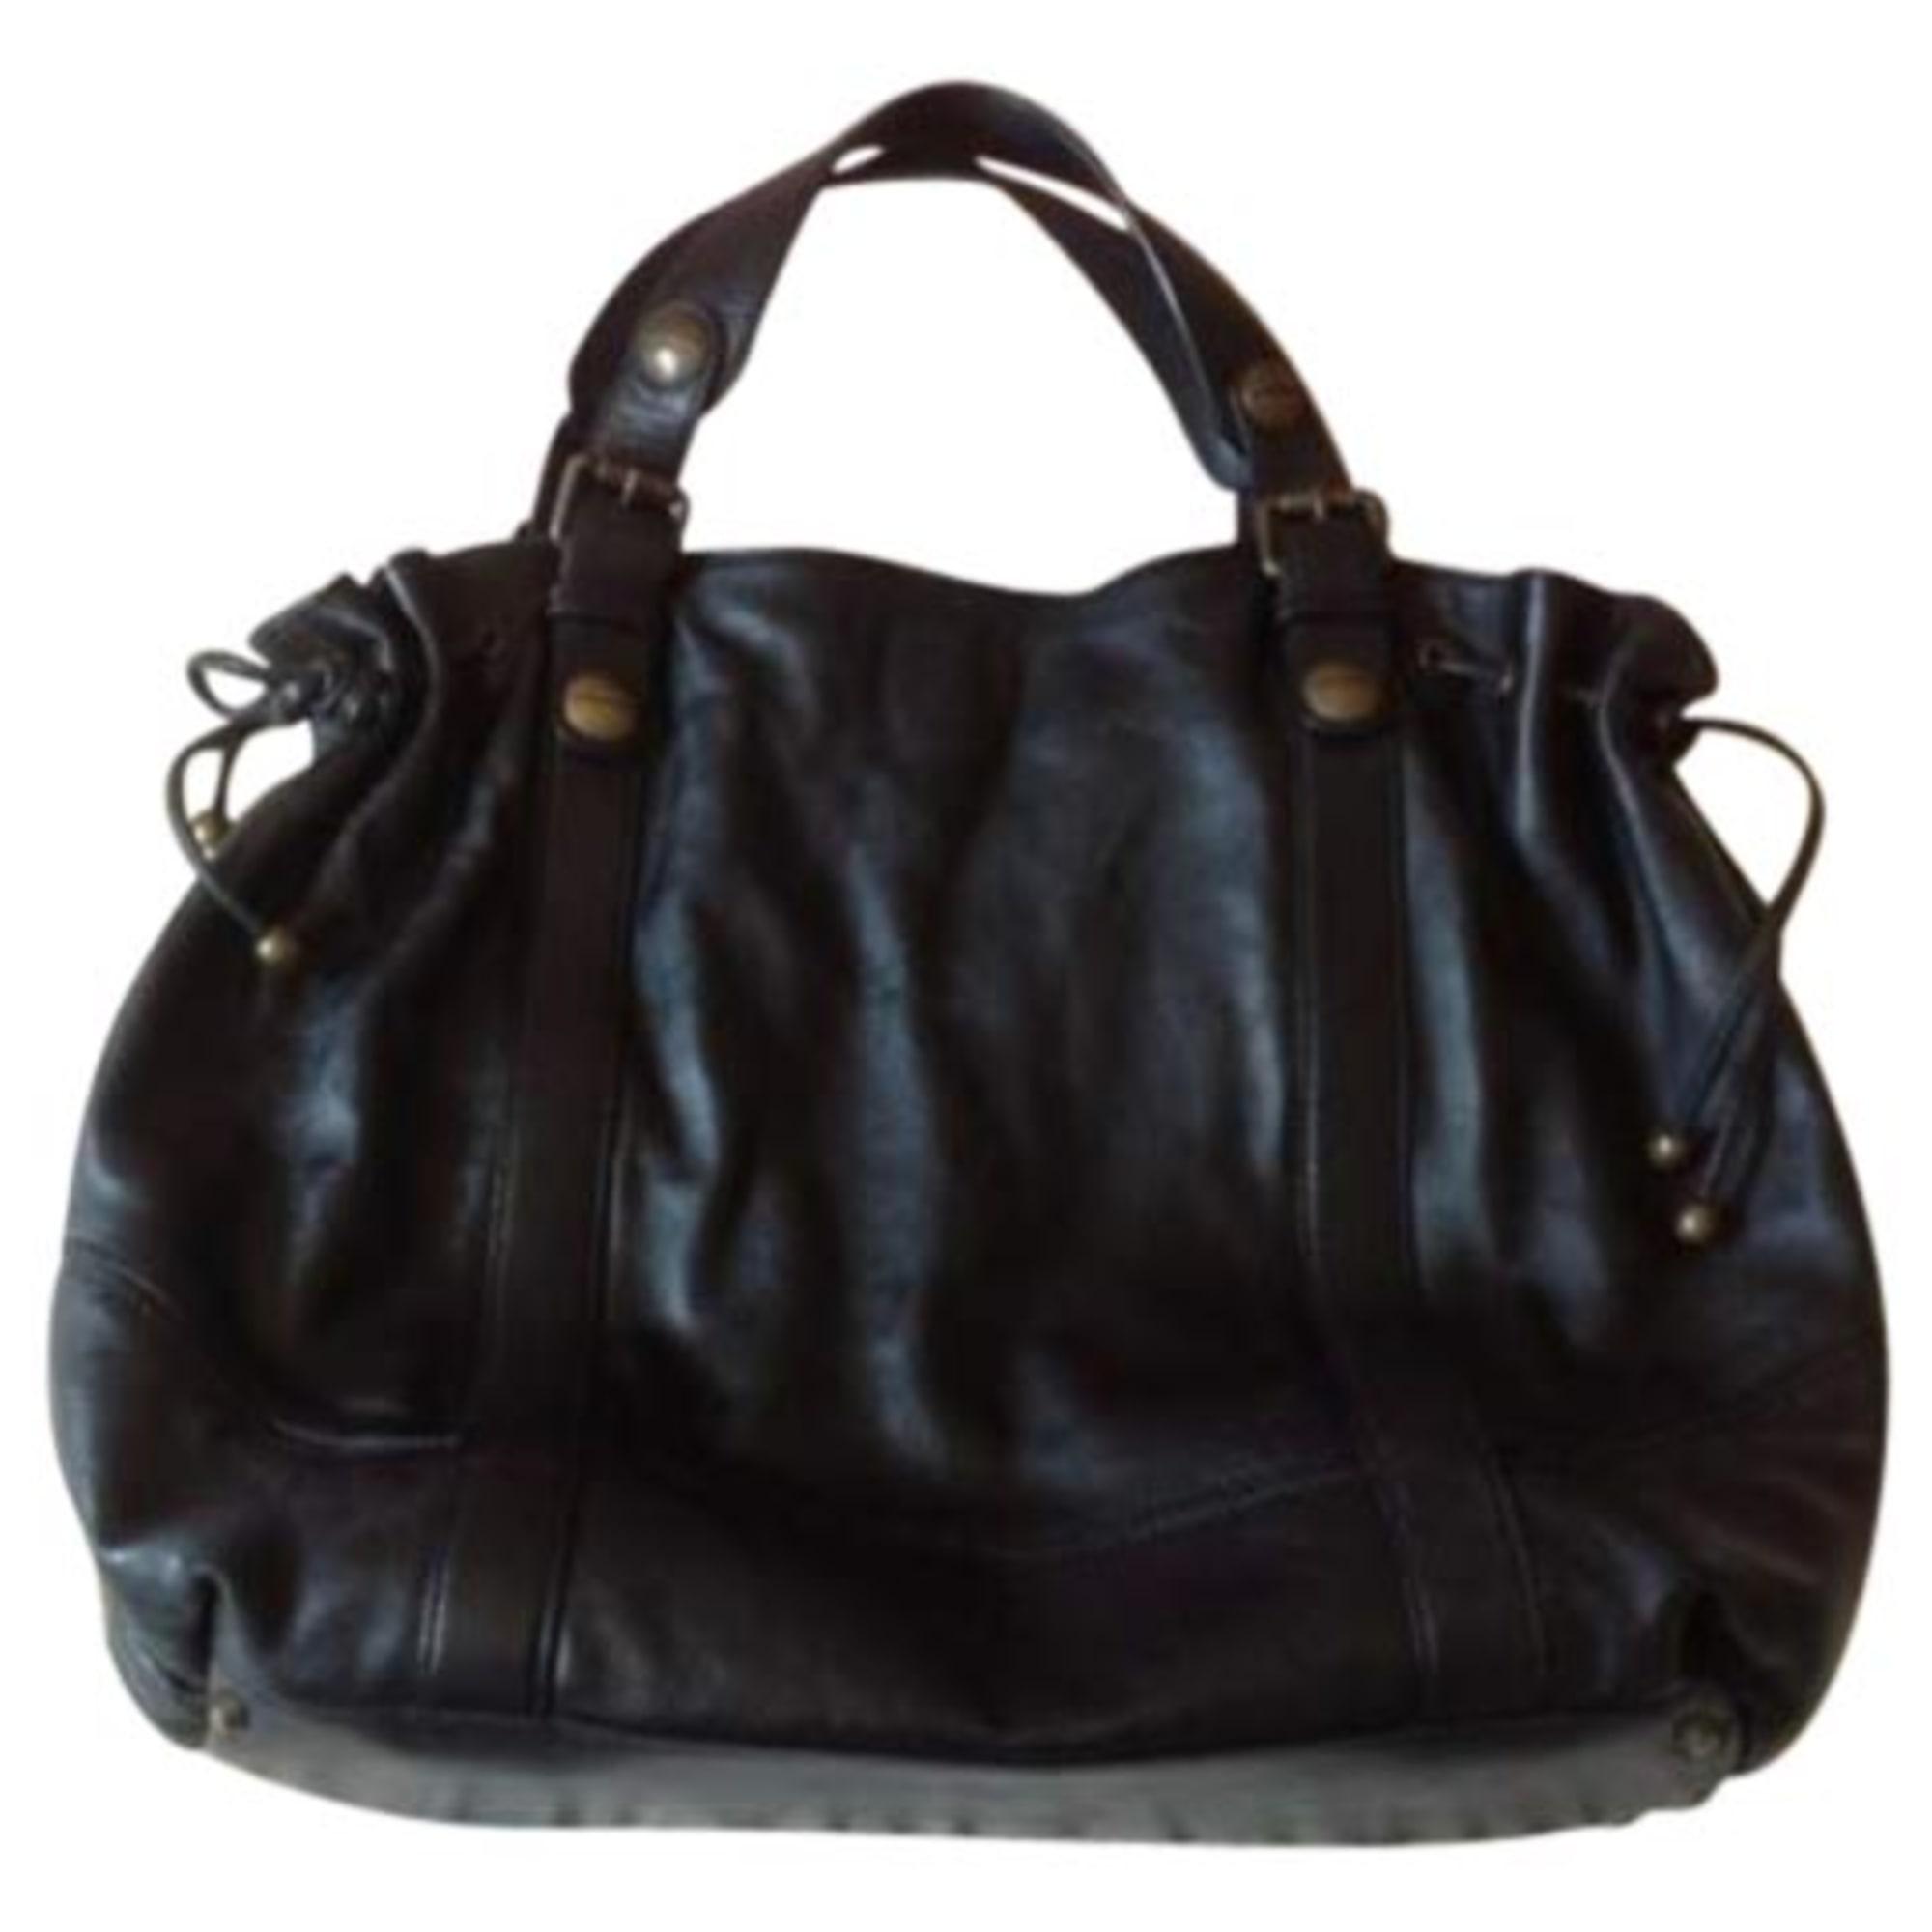 6ef114ae60 Sac XL en cuir GERARD DAREL noir vendu par Crisanta - 1656202